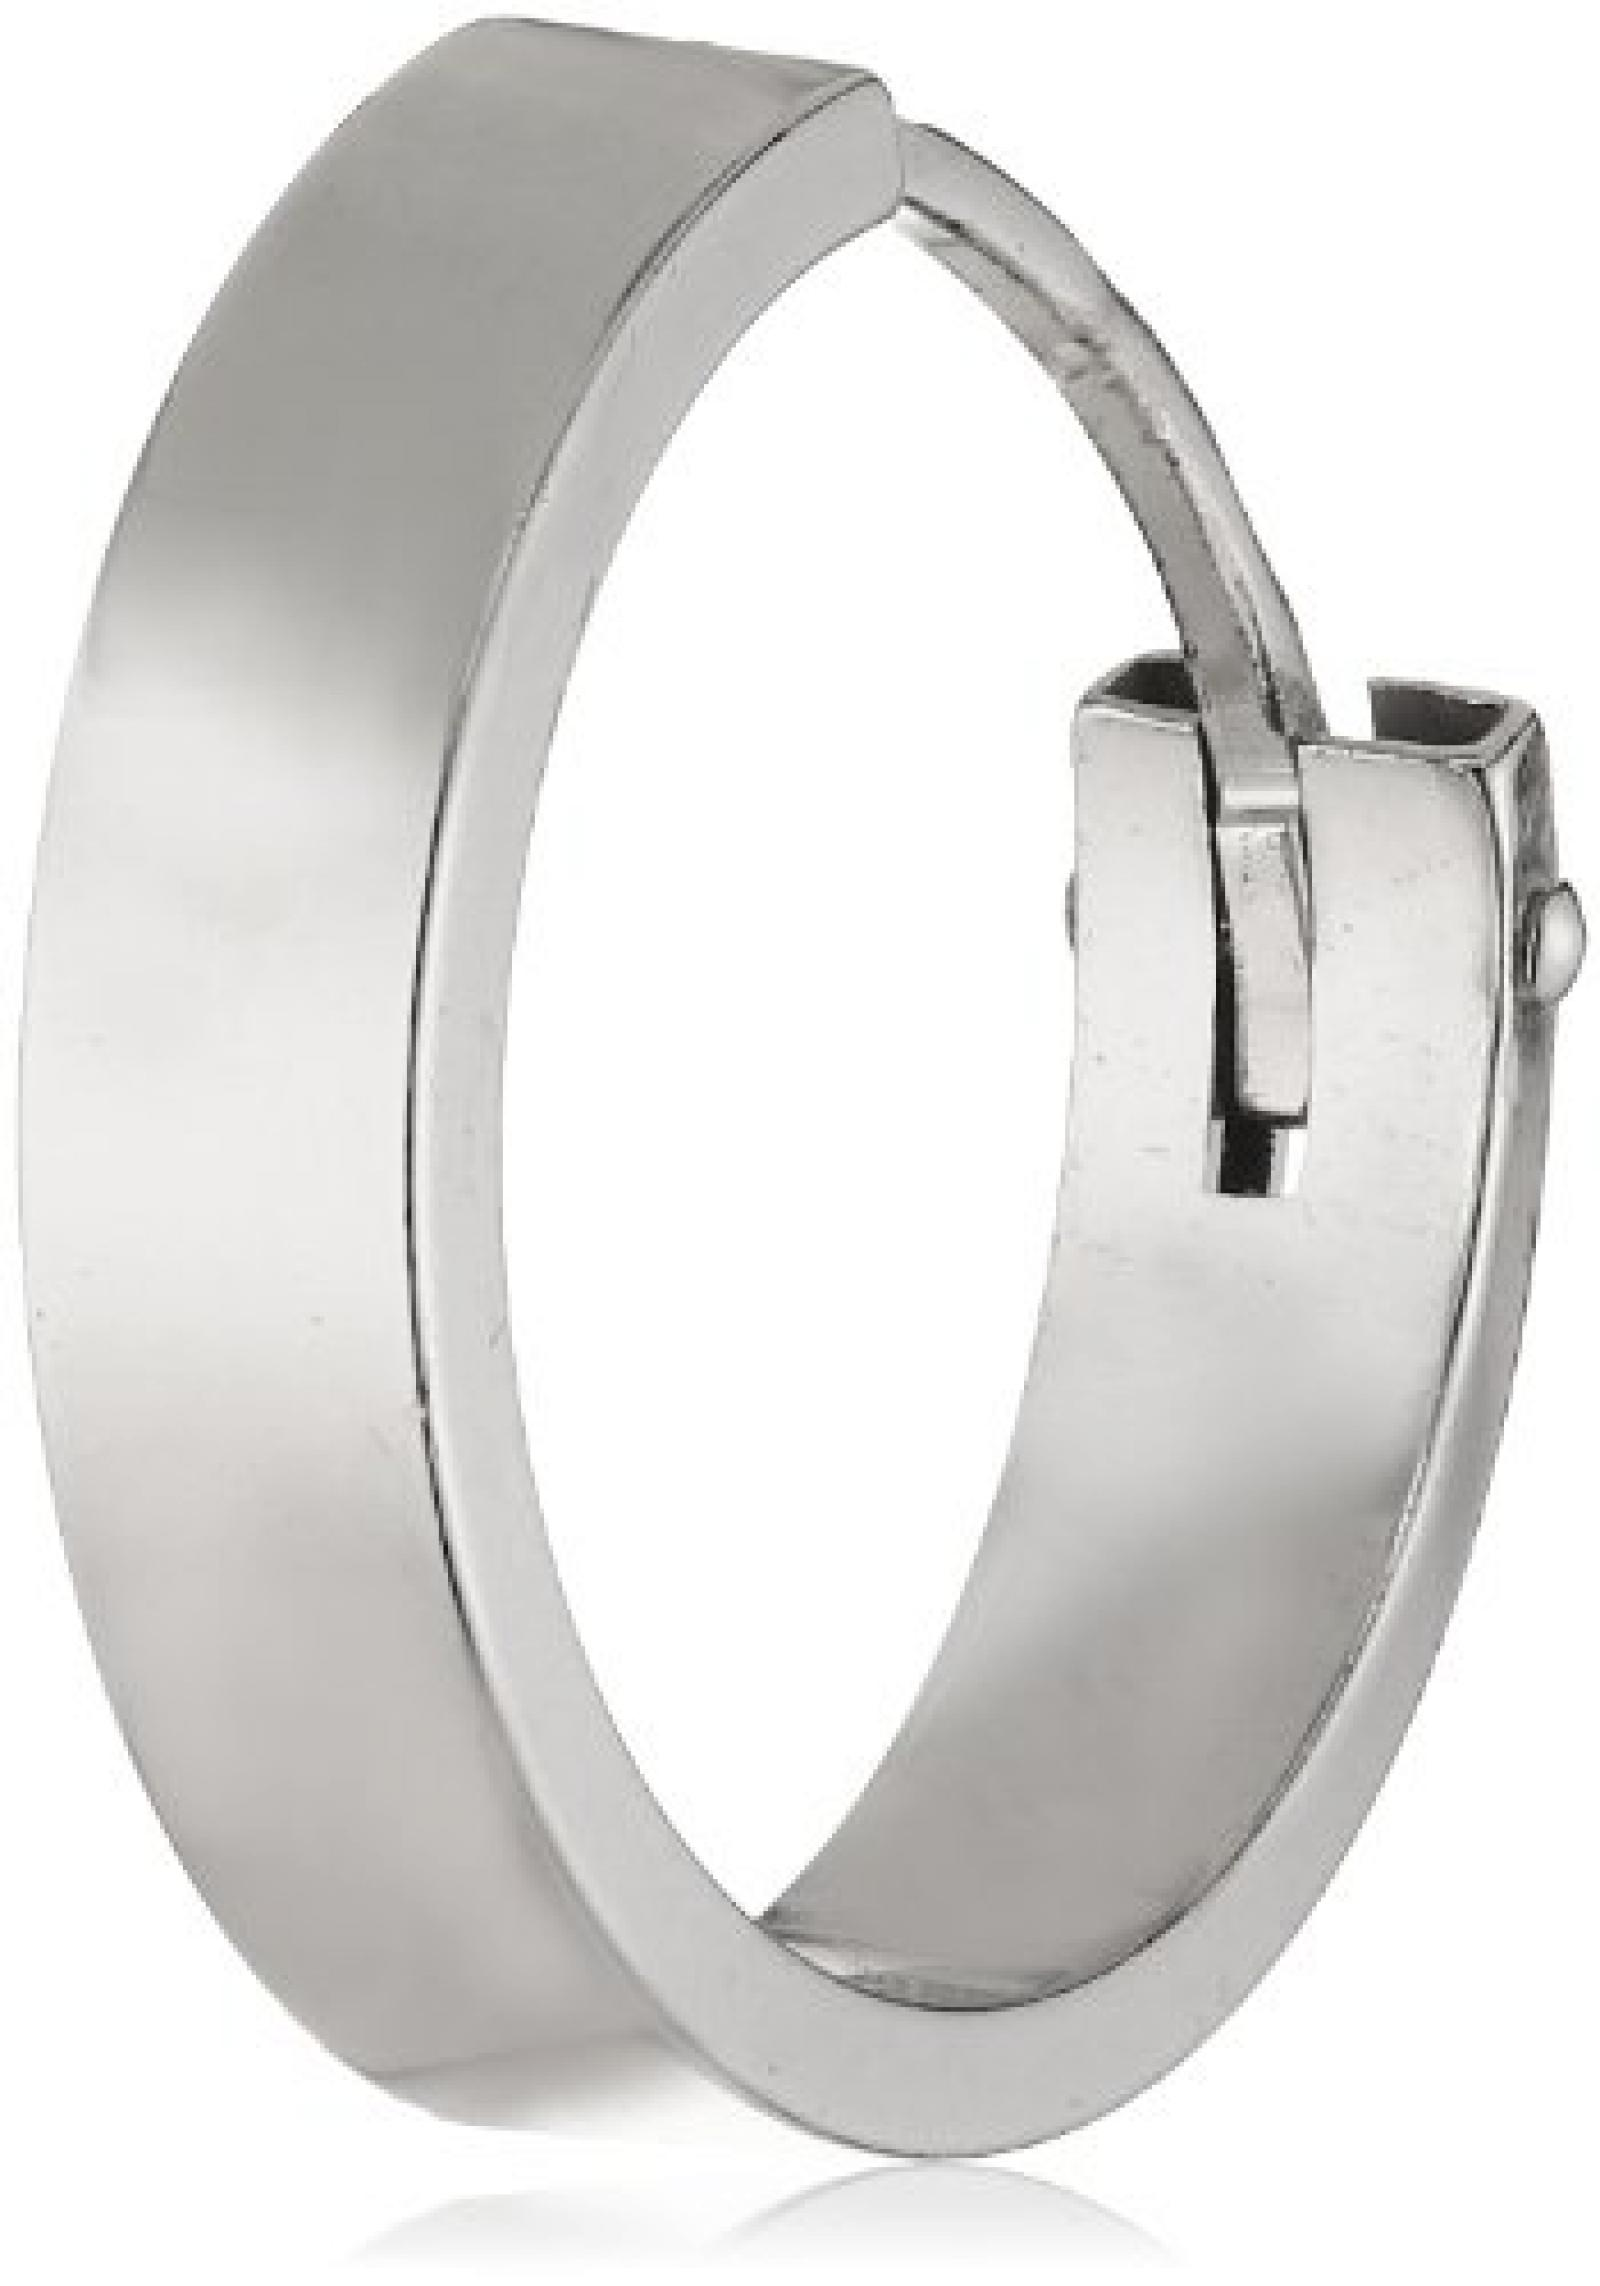 Amor Jewelry Damen-Creolen 925 Sterling Silber 328623